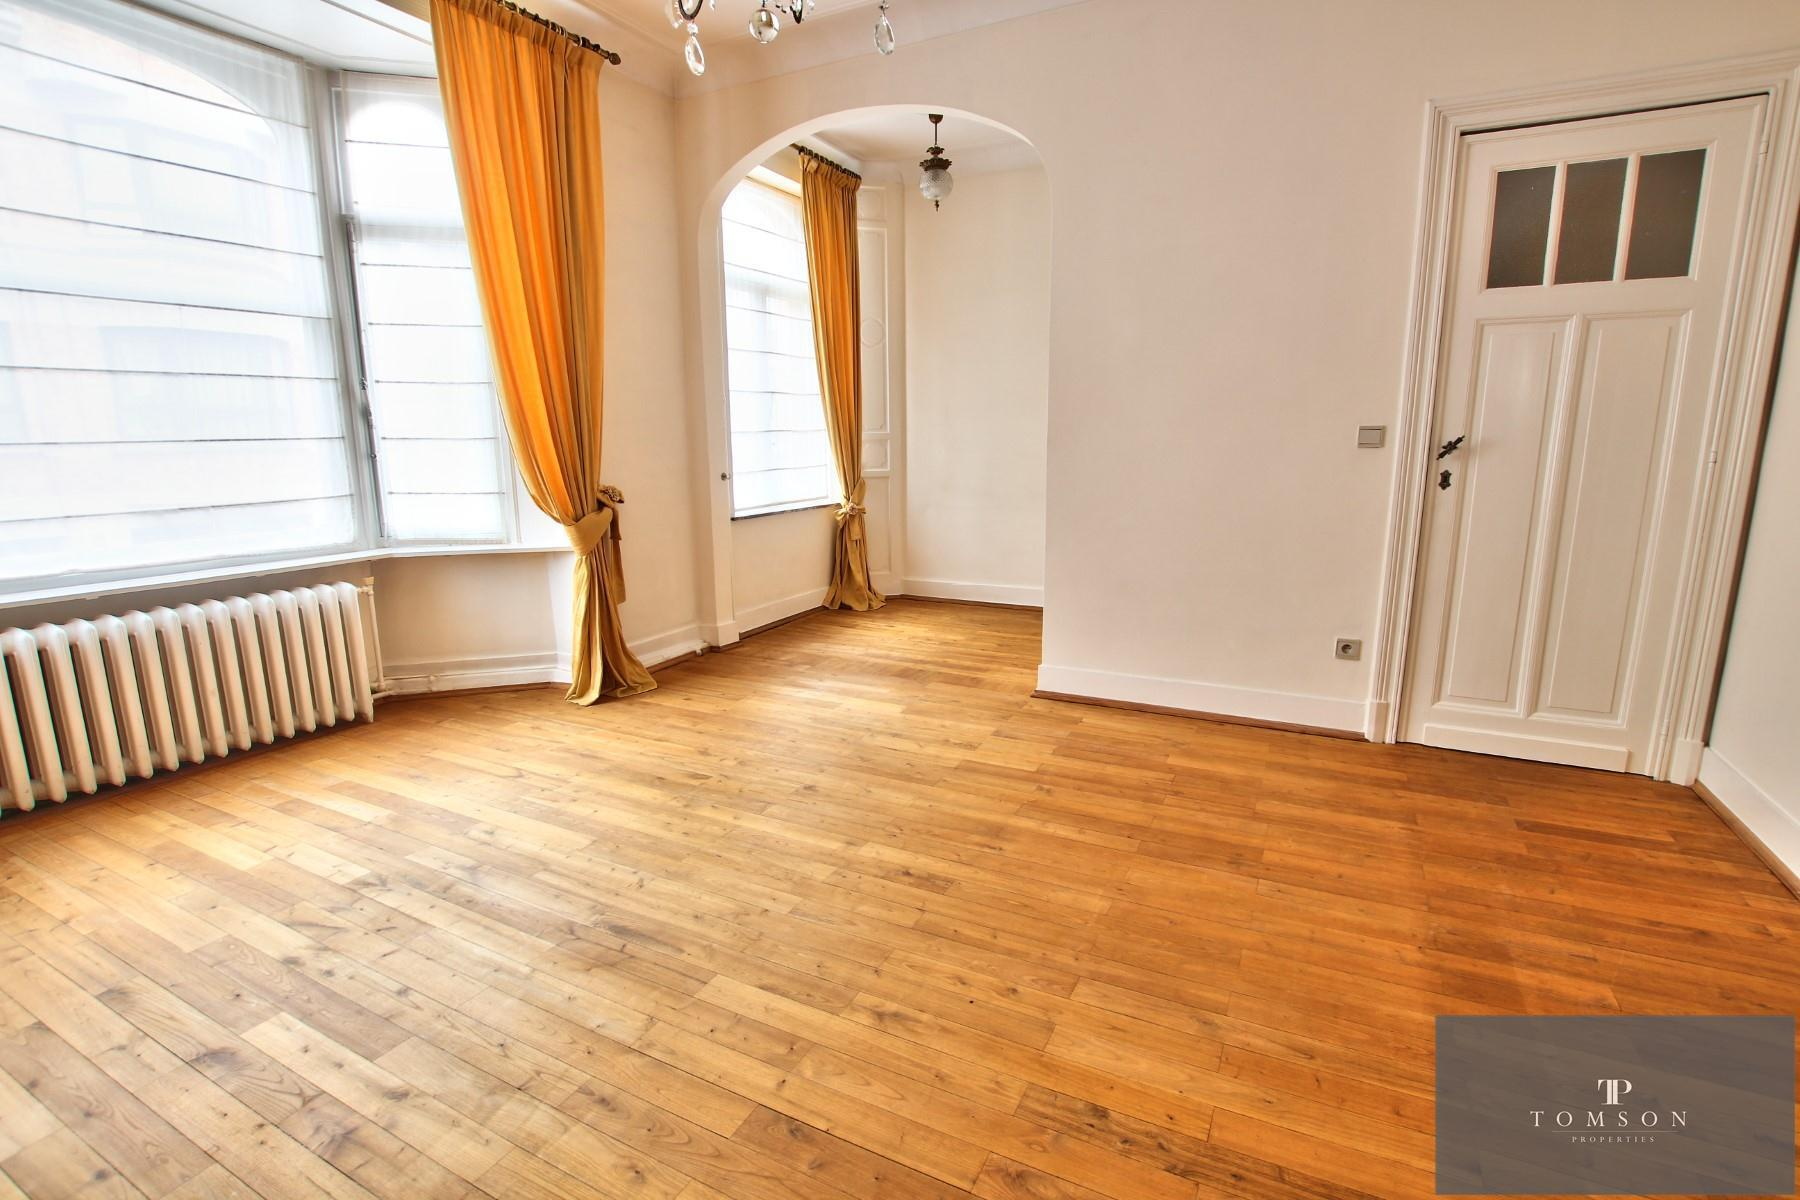 House - Etterbeek - #4246787-4